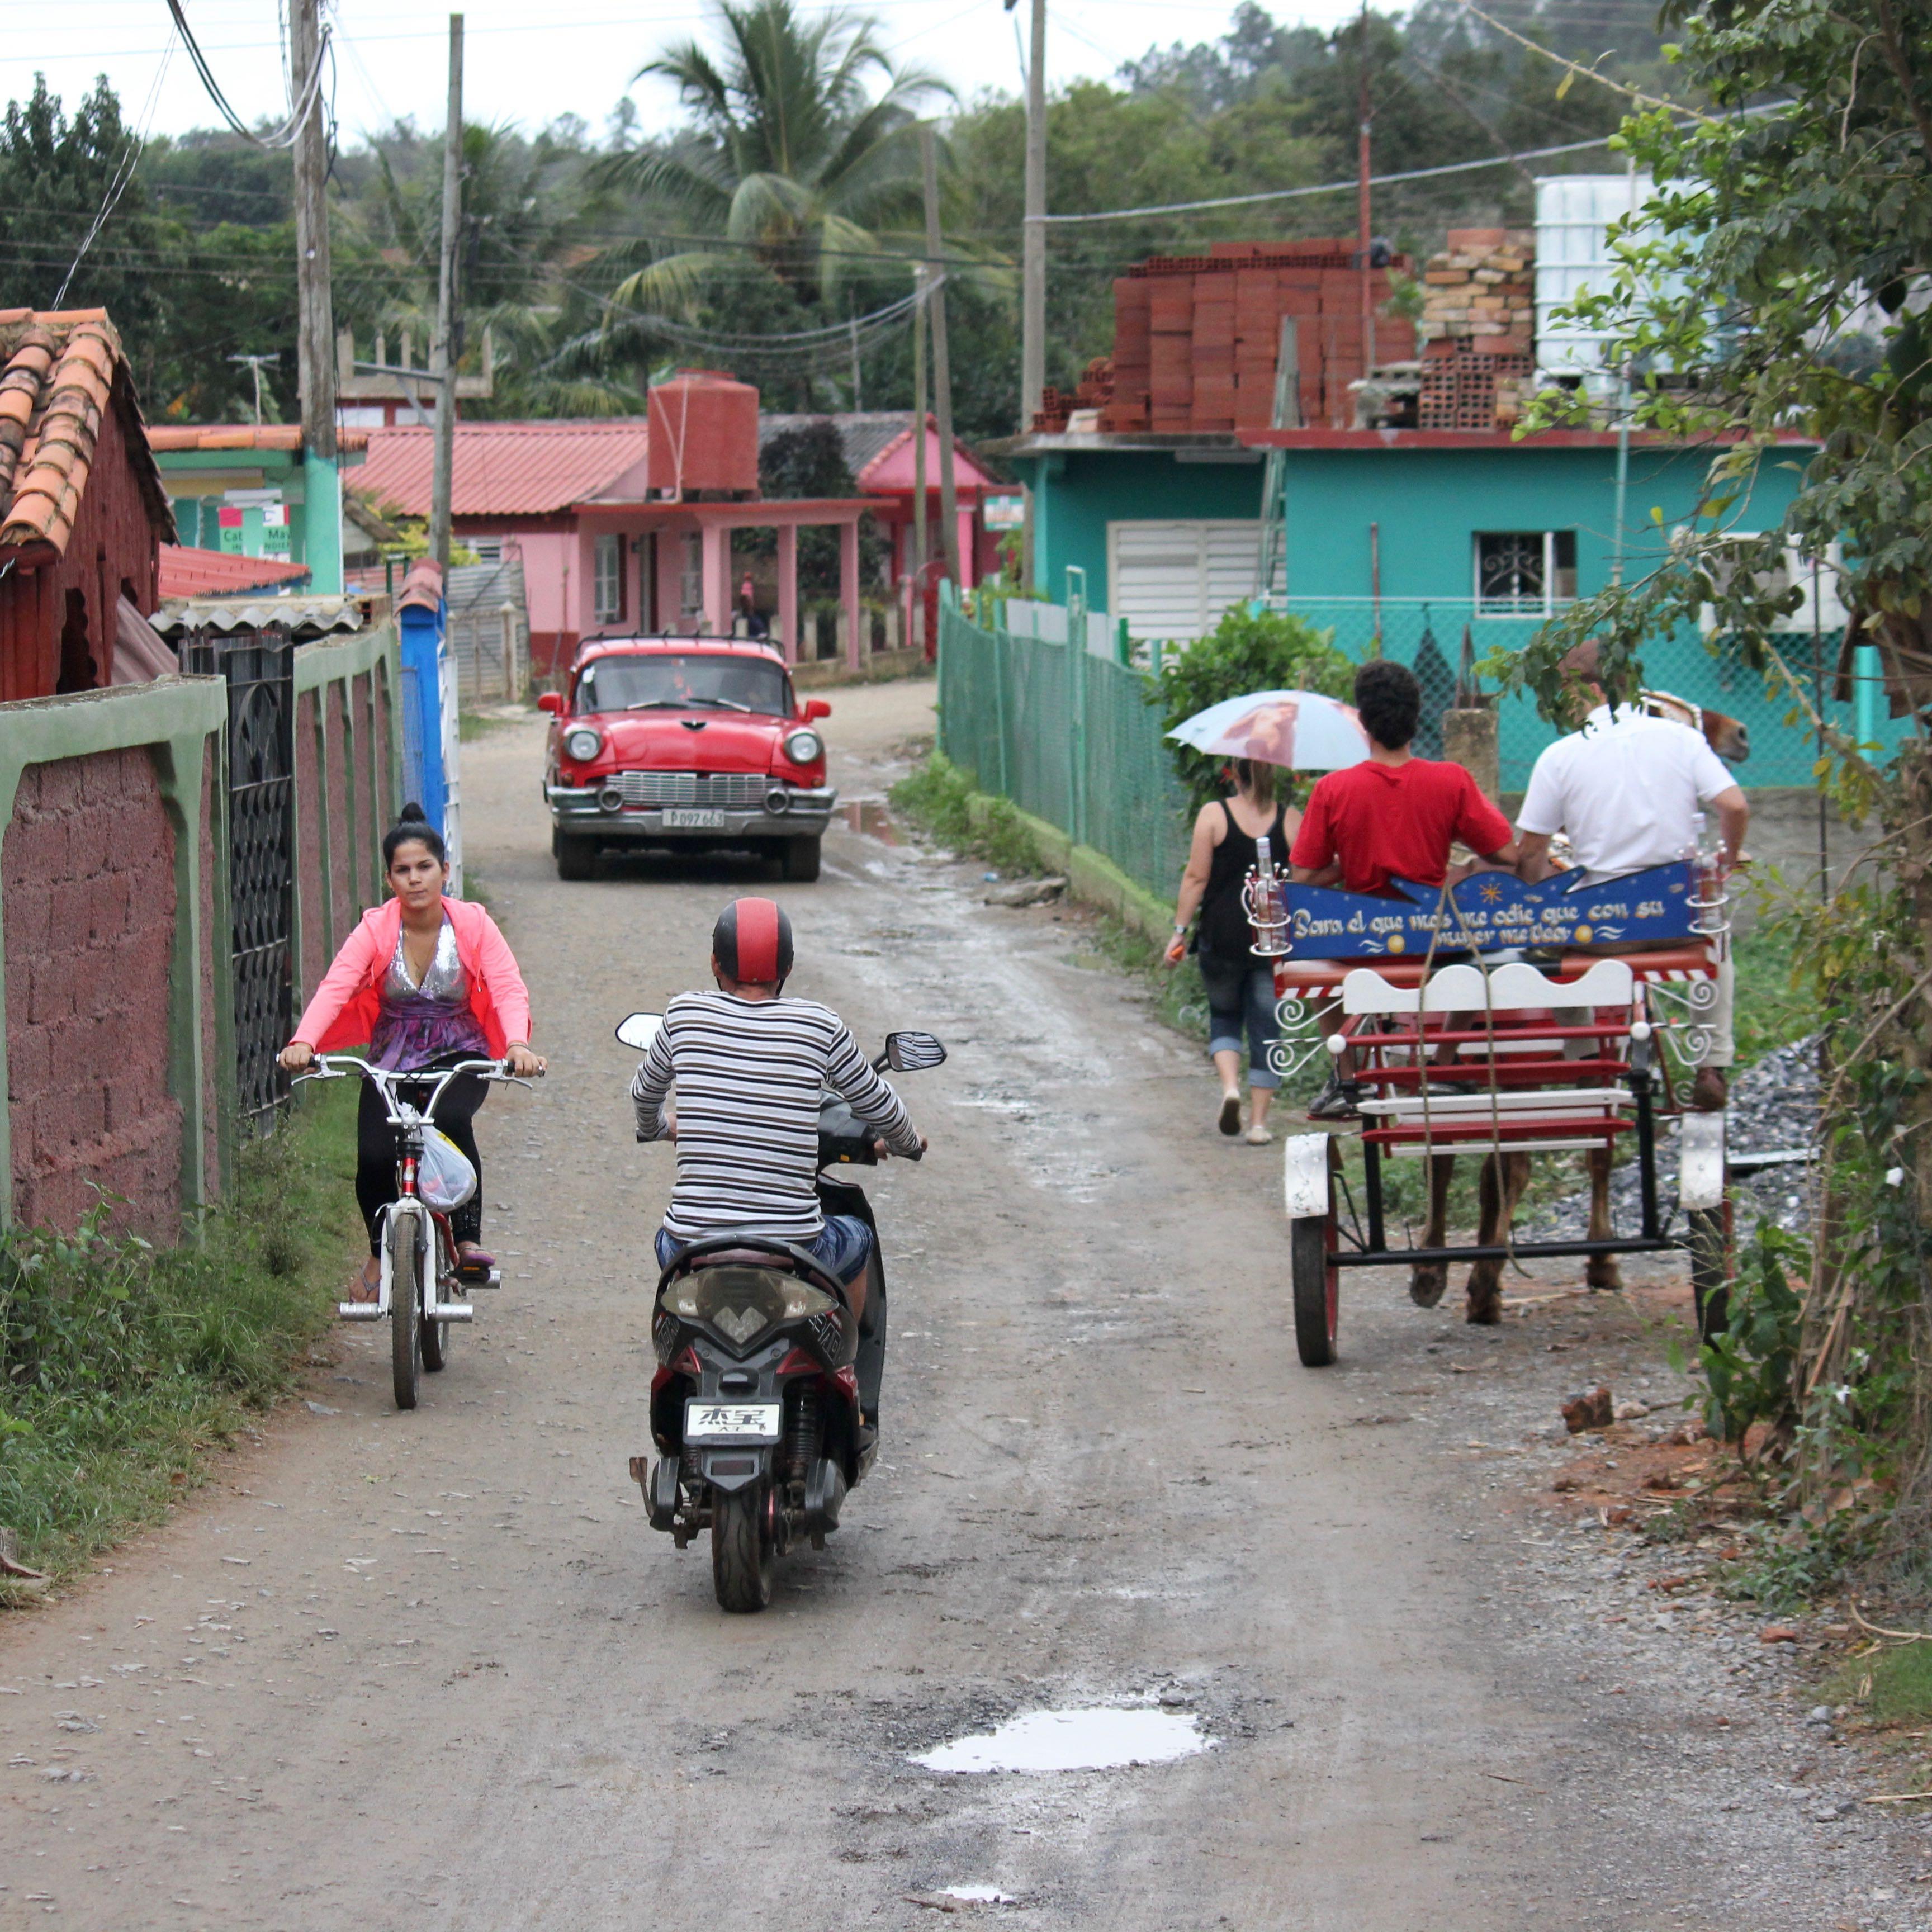 vinales, Cuba traffic